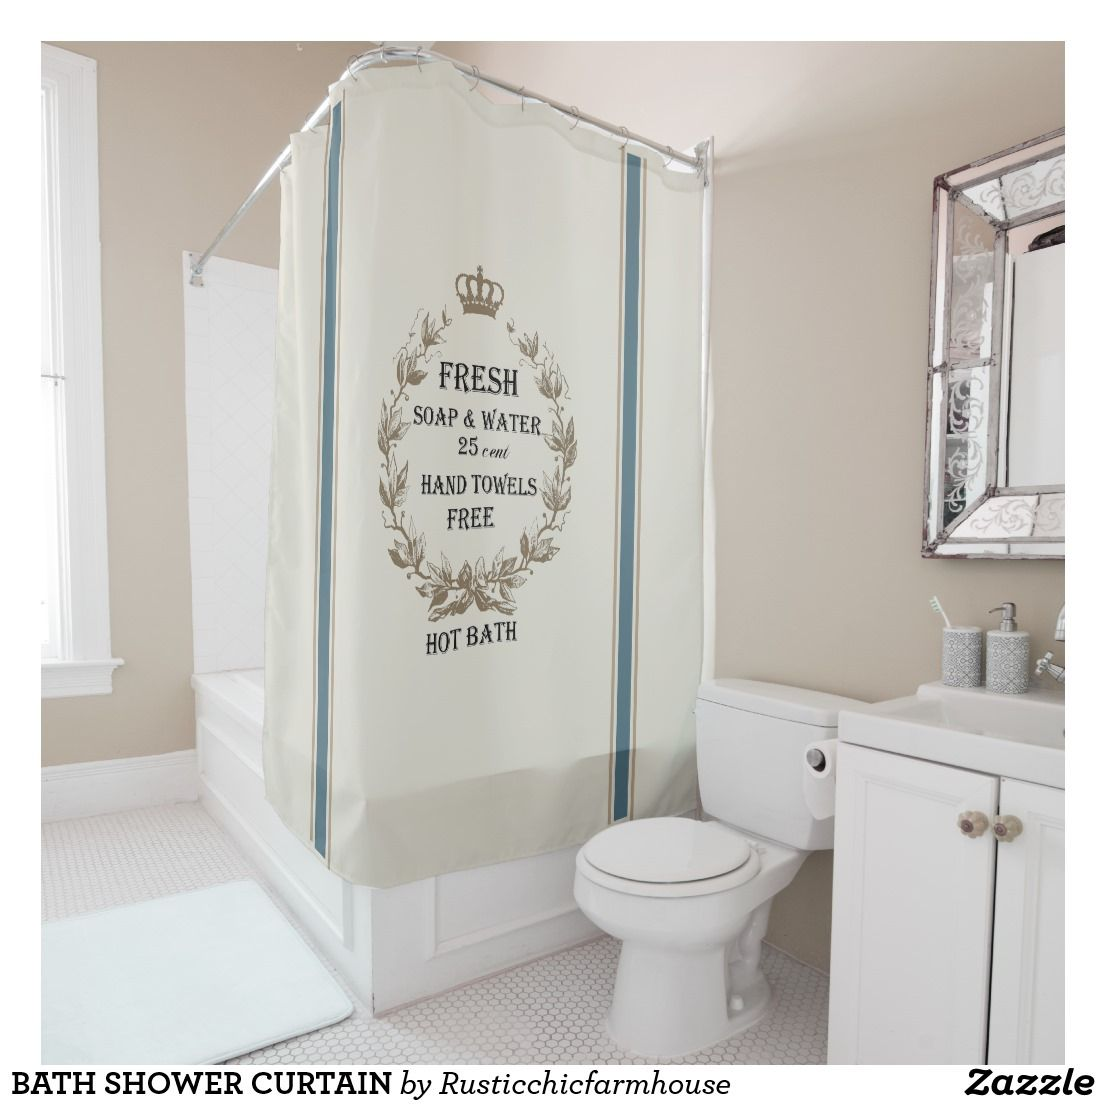 BATH SHOWER CURTAIN Modern bathroom decor